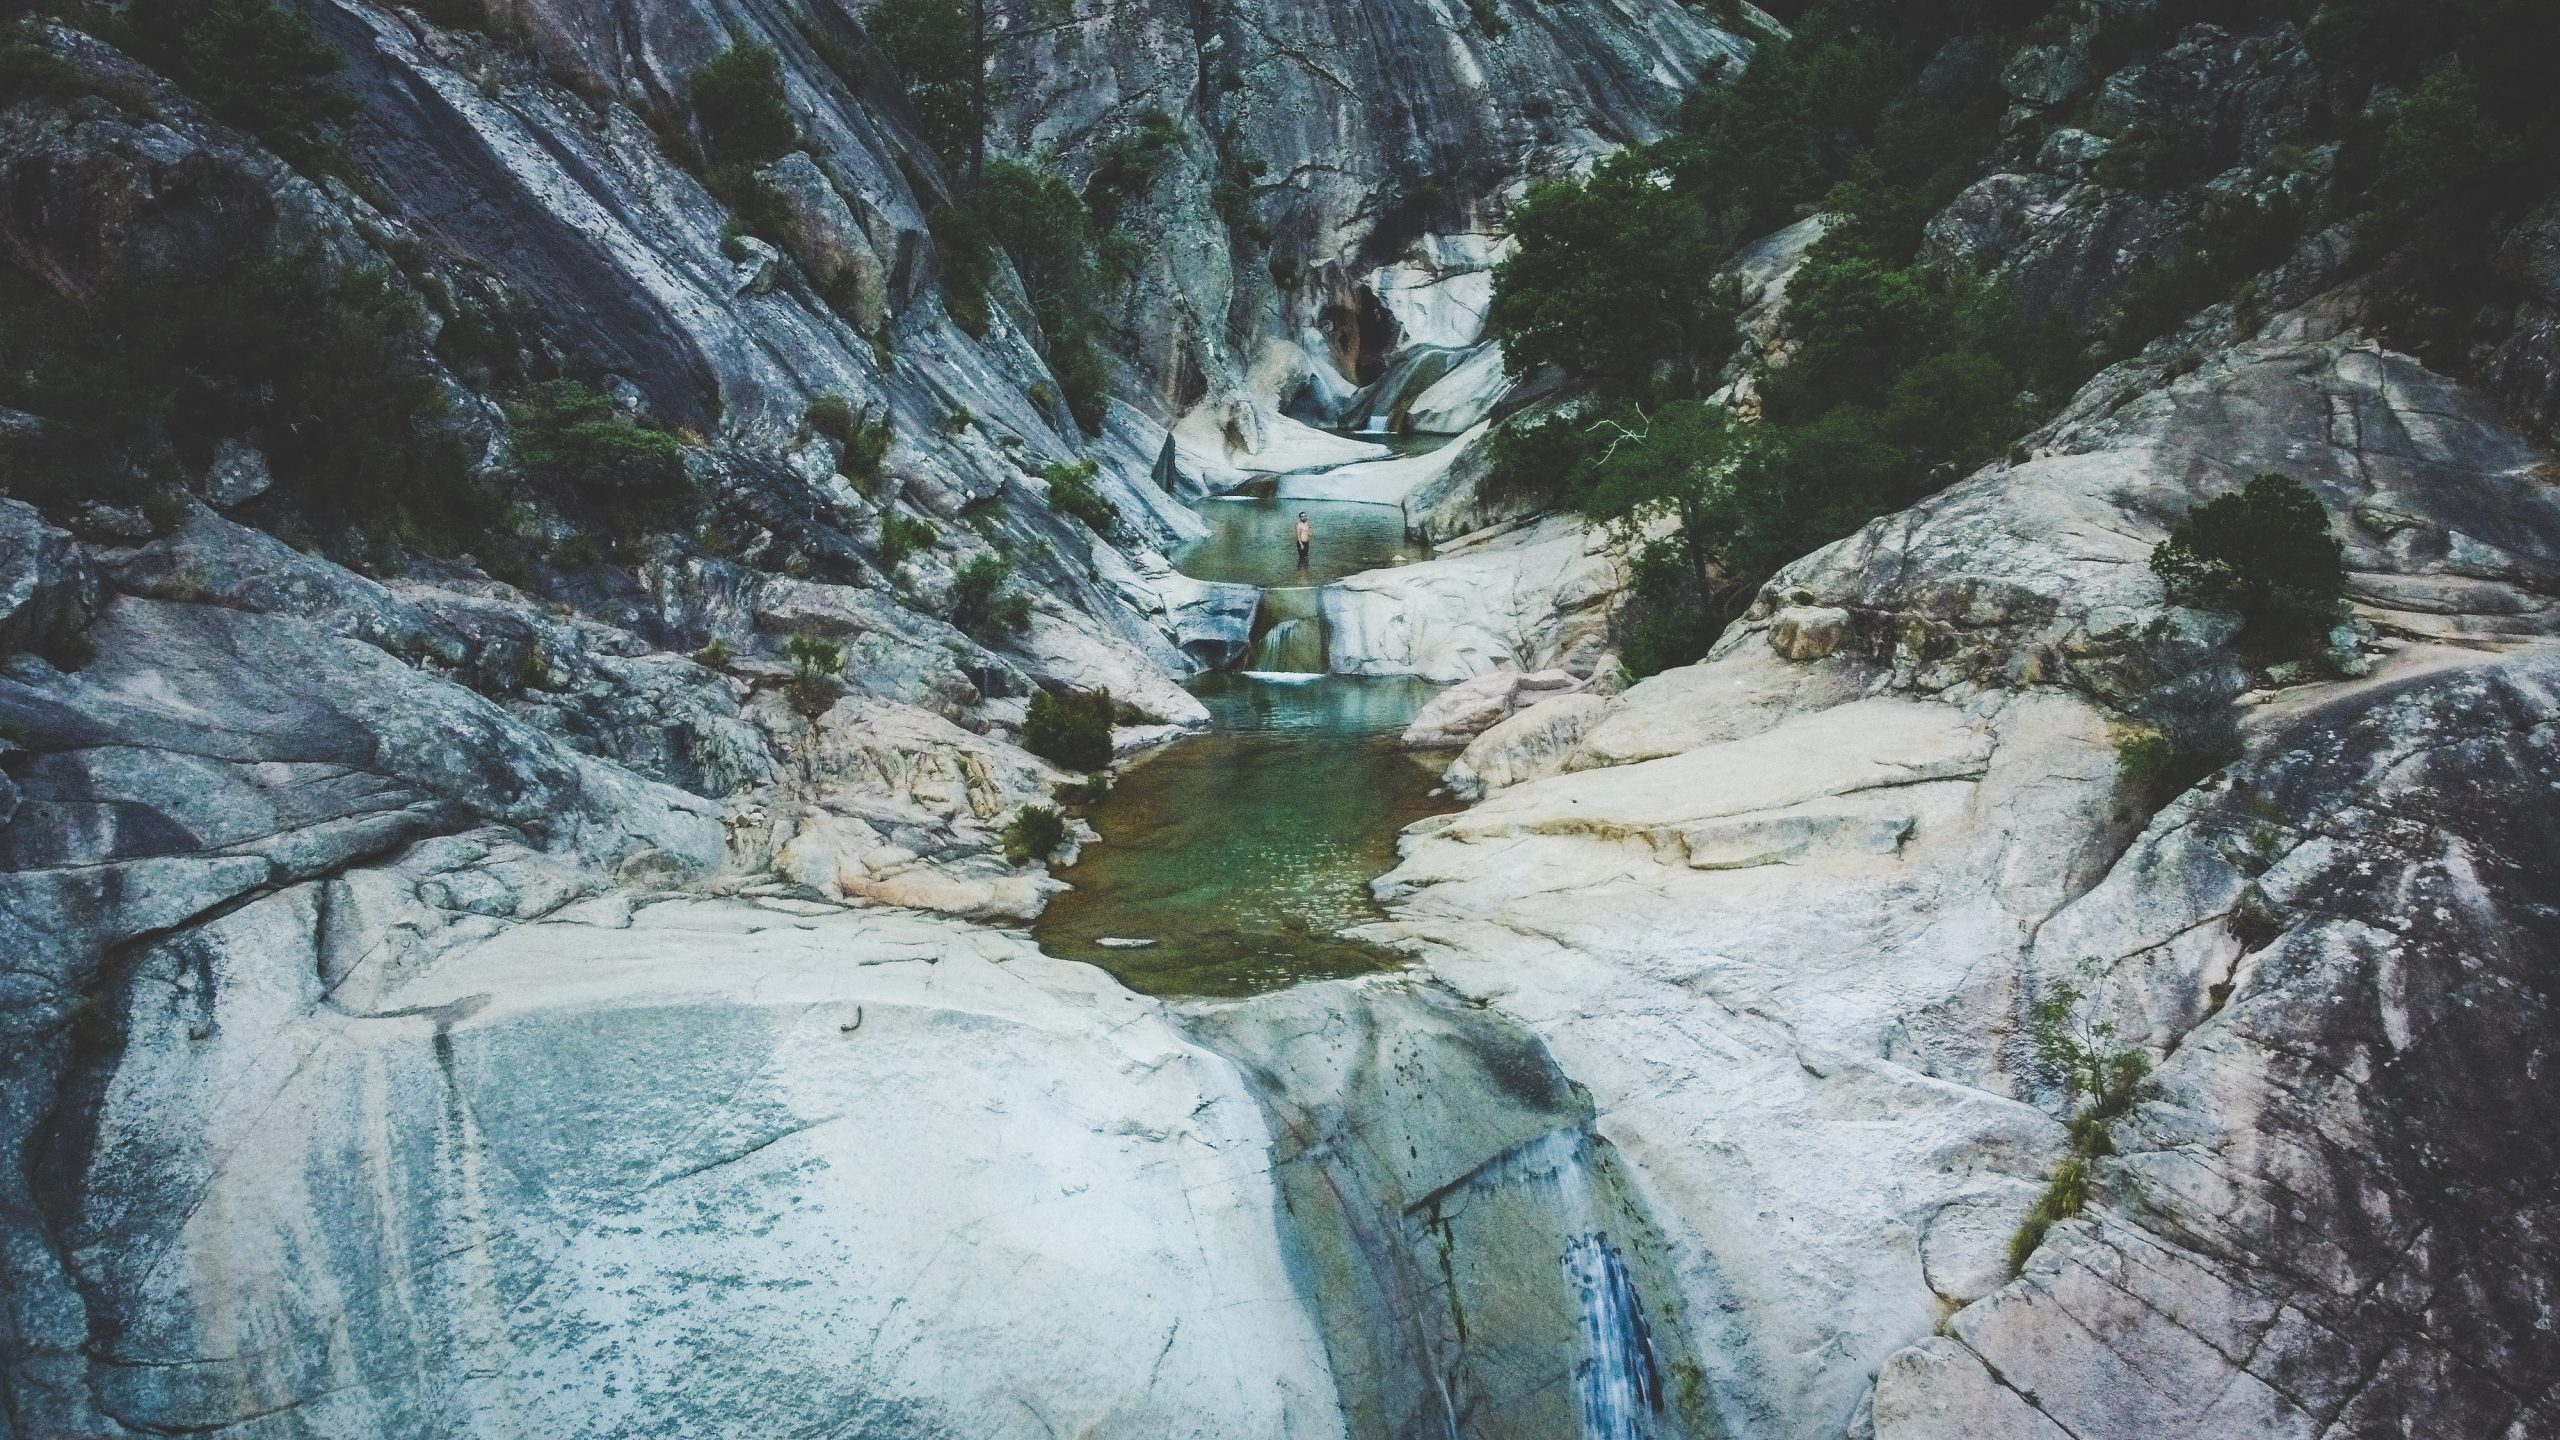 Les cascades de Purcaraccia en corse, une merveille